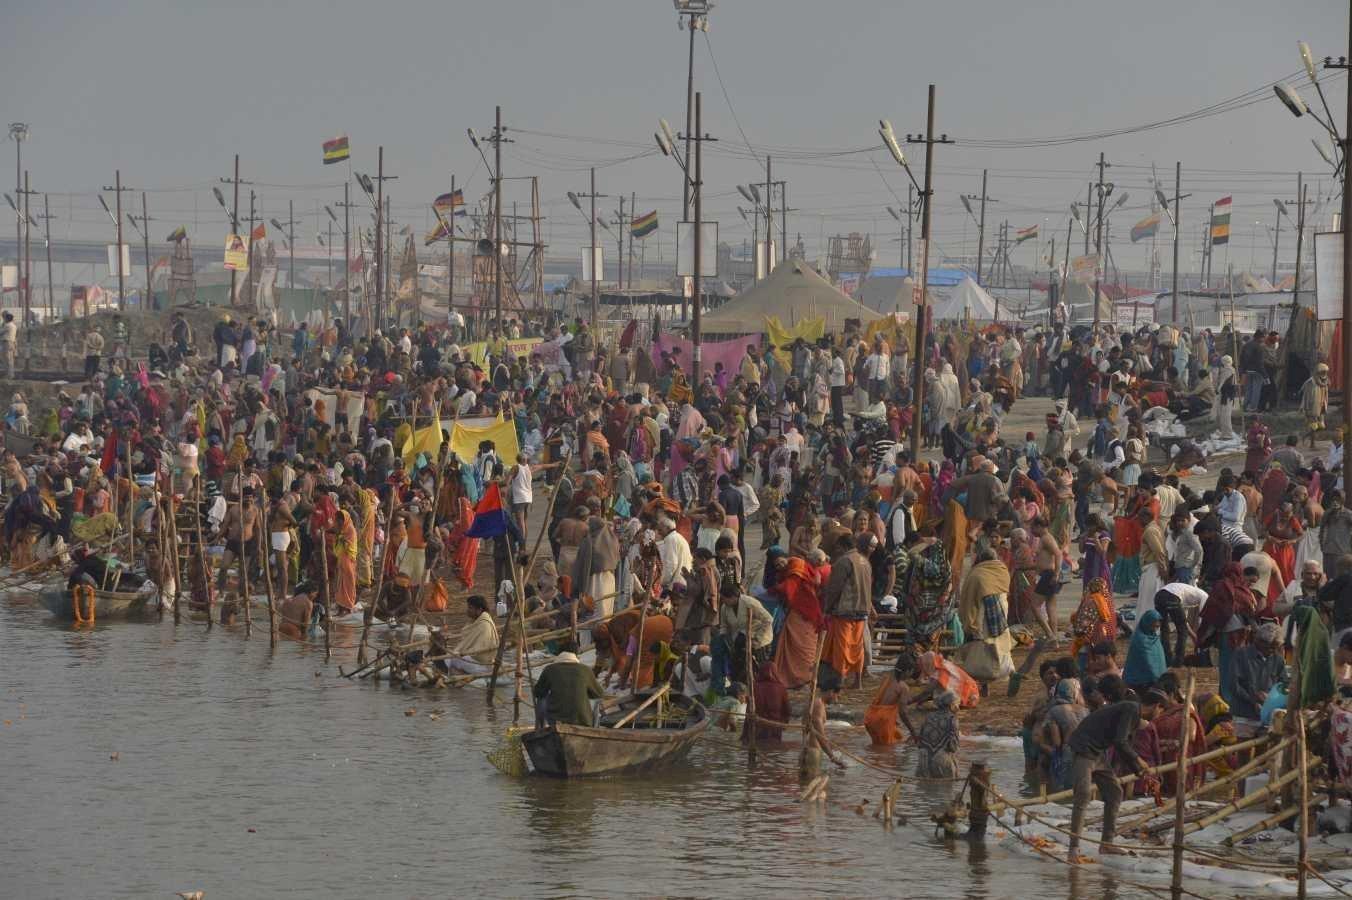 India - Allabhad